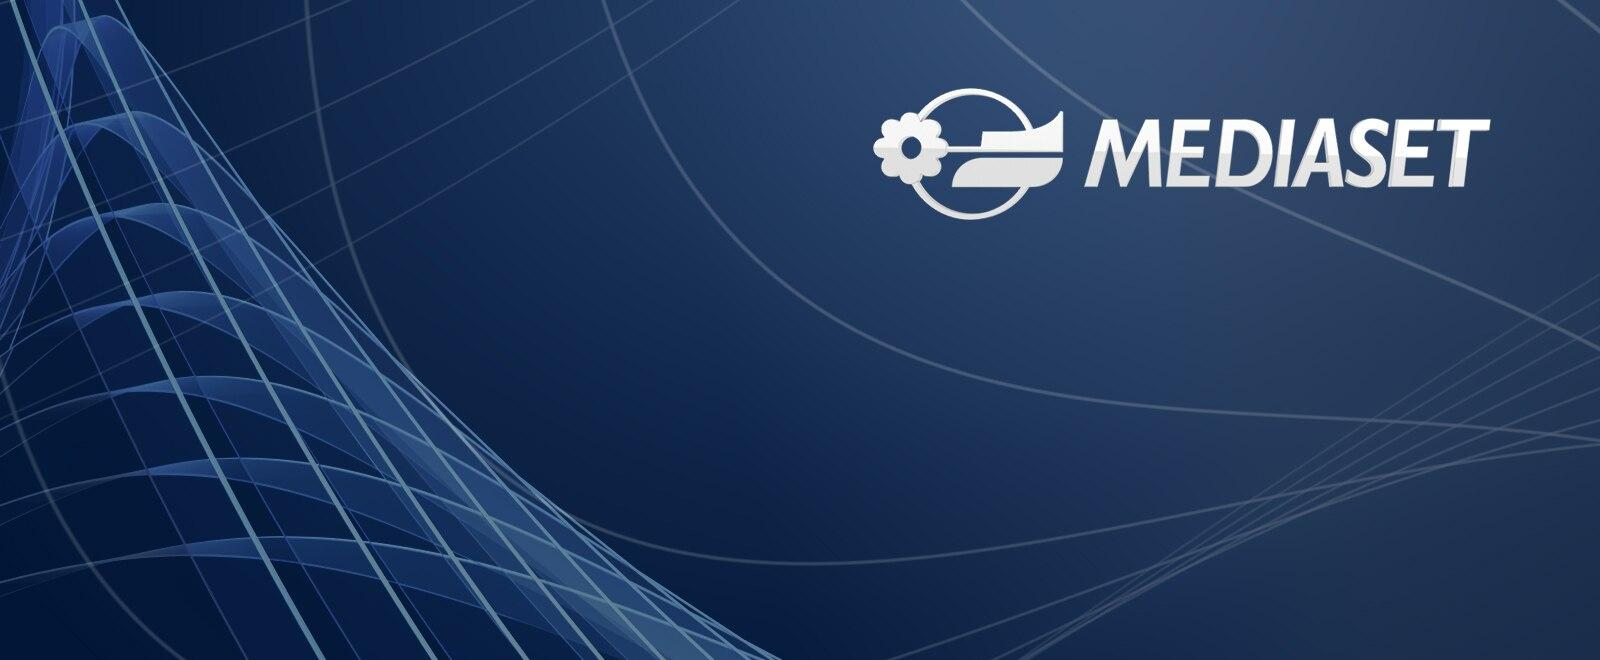 Preview uefa nations league - 21